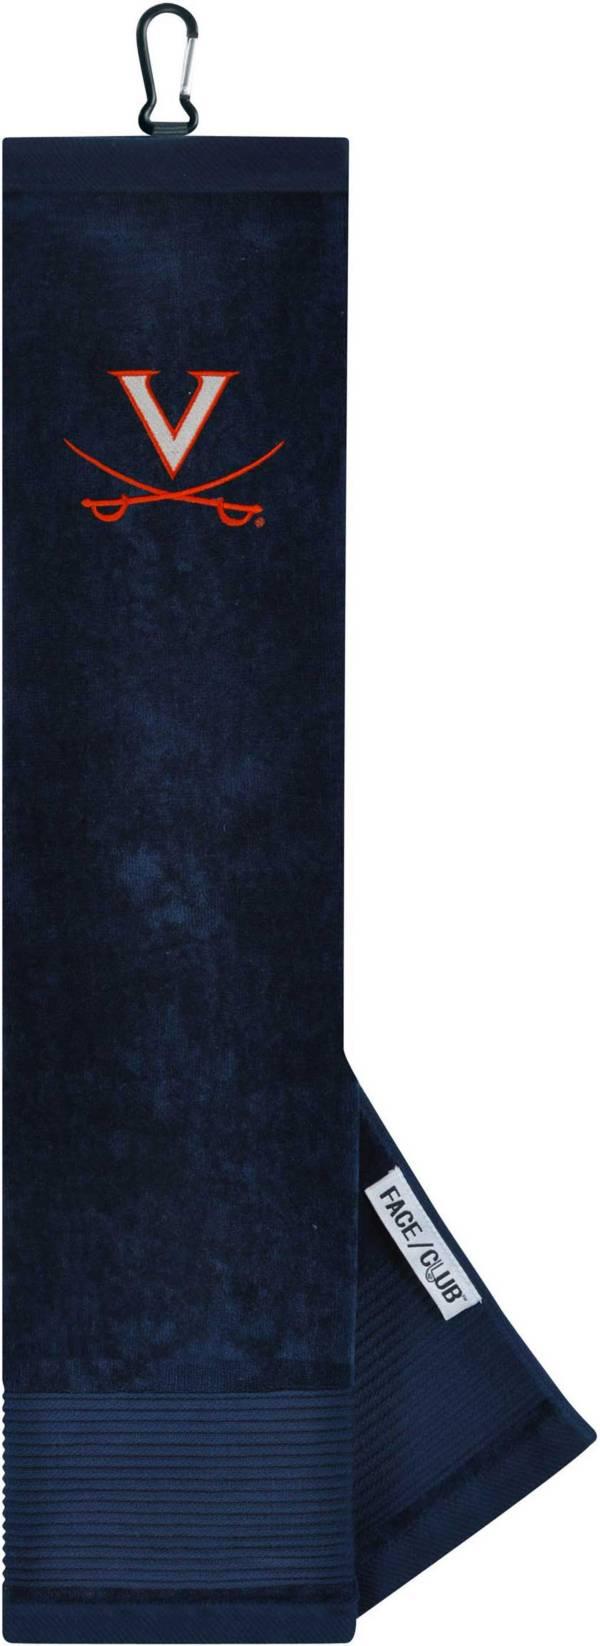 Team Effort Virginia Cavaliers Embroidered Face/Club Tri-Fold Towel product image